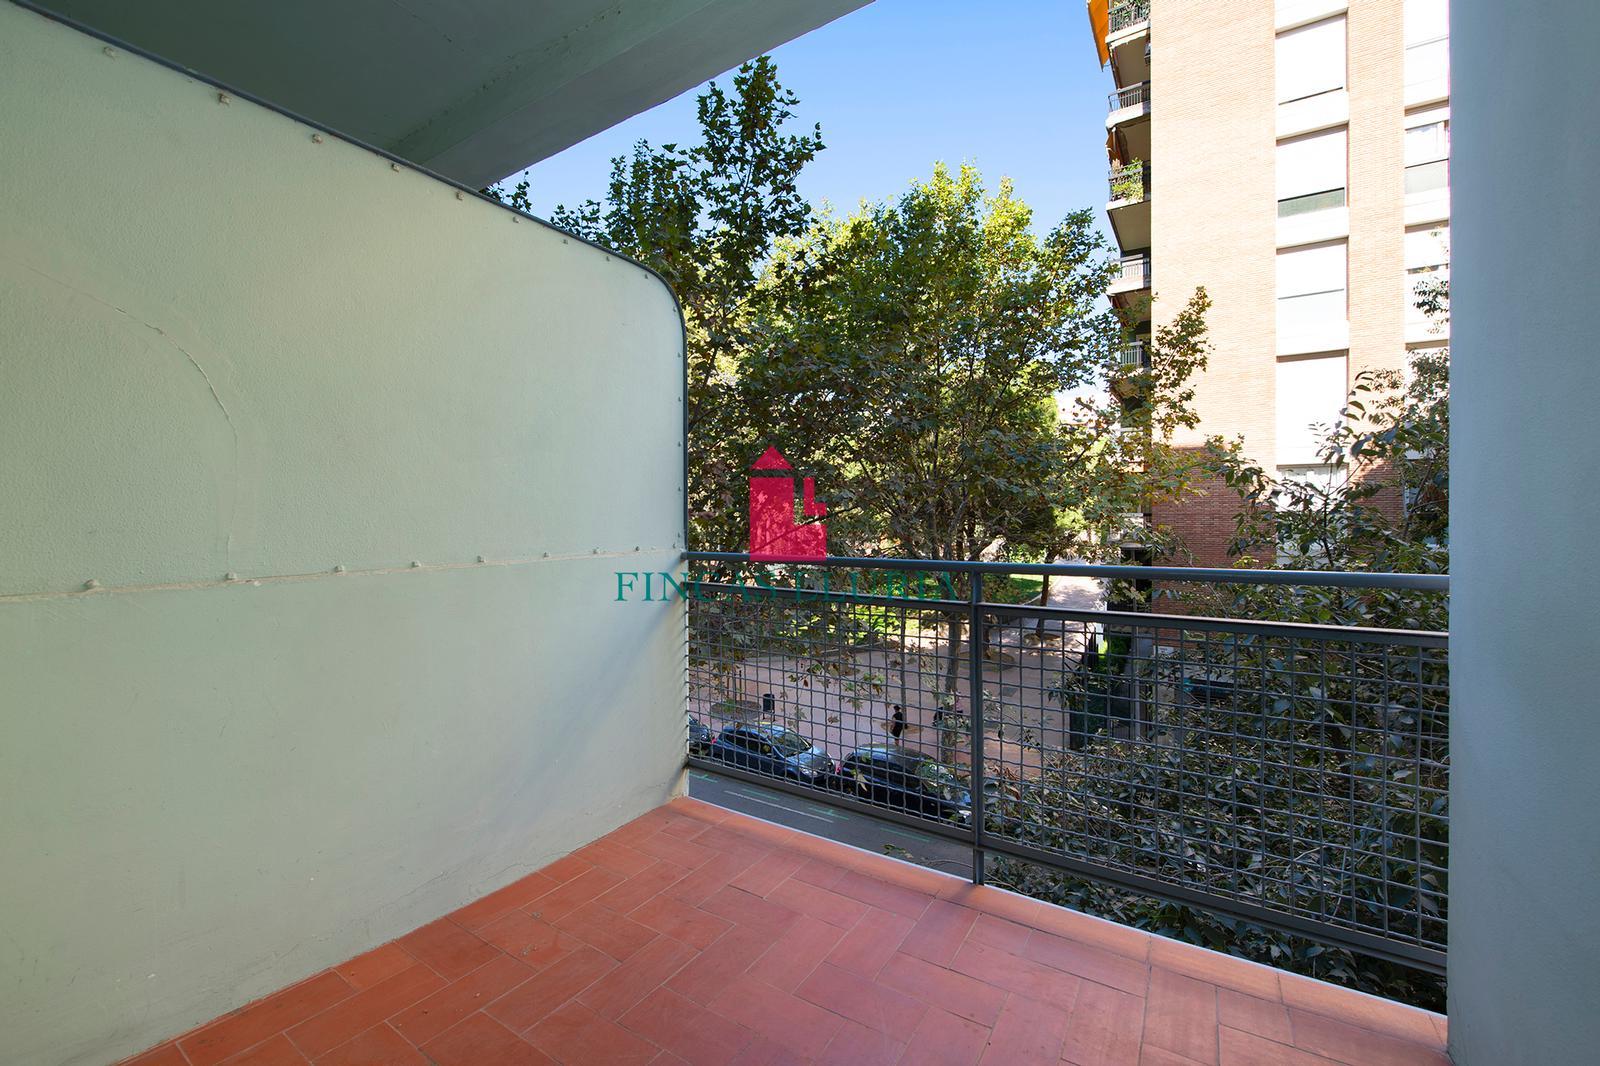 Ref.: 32455 - FINCA CATALOGADA A L'EIXAMPLE